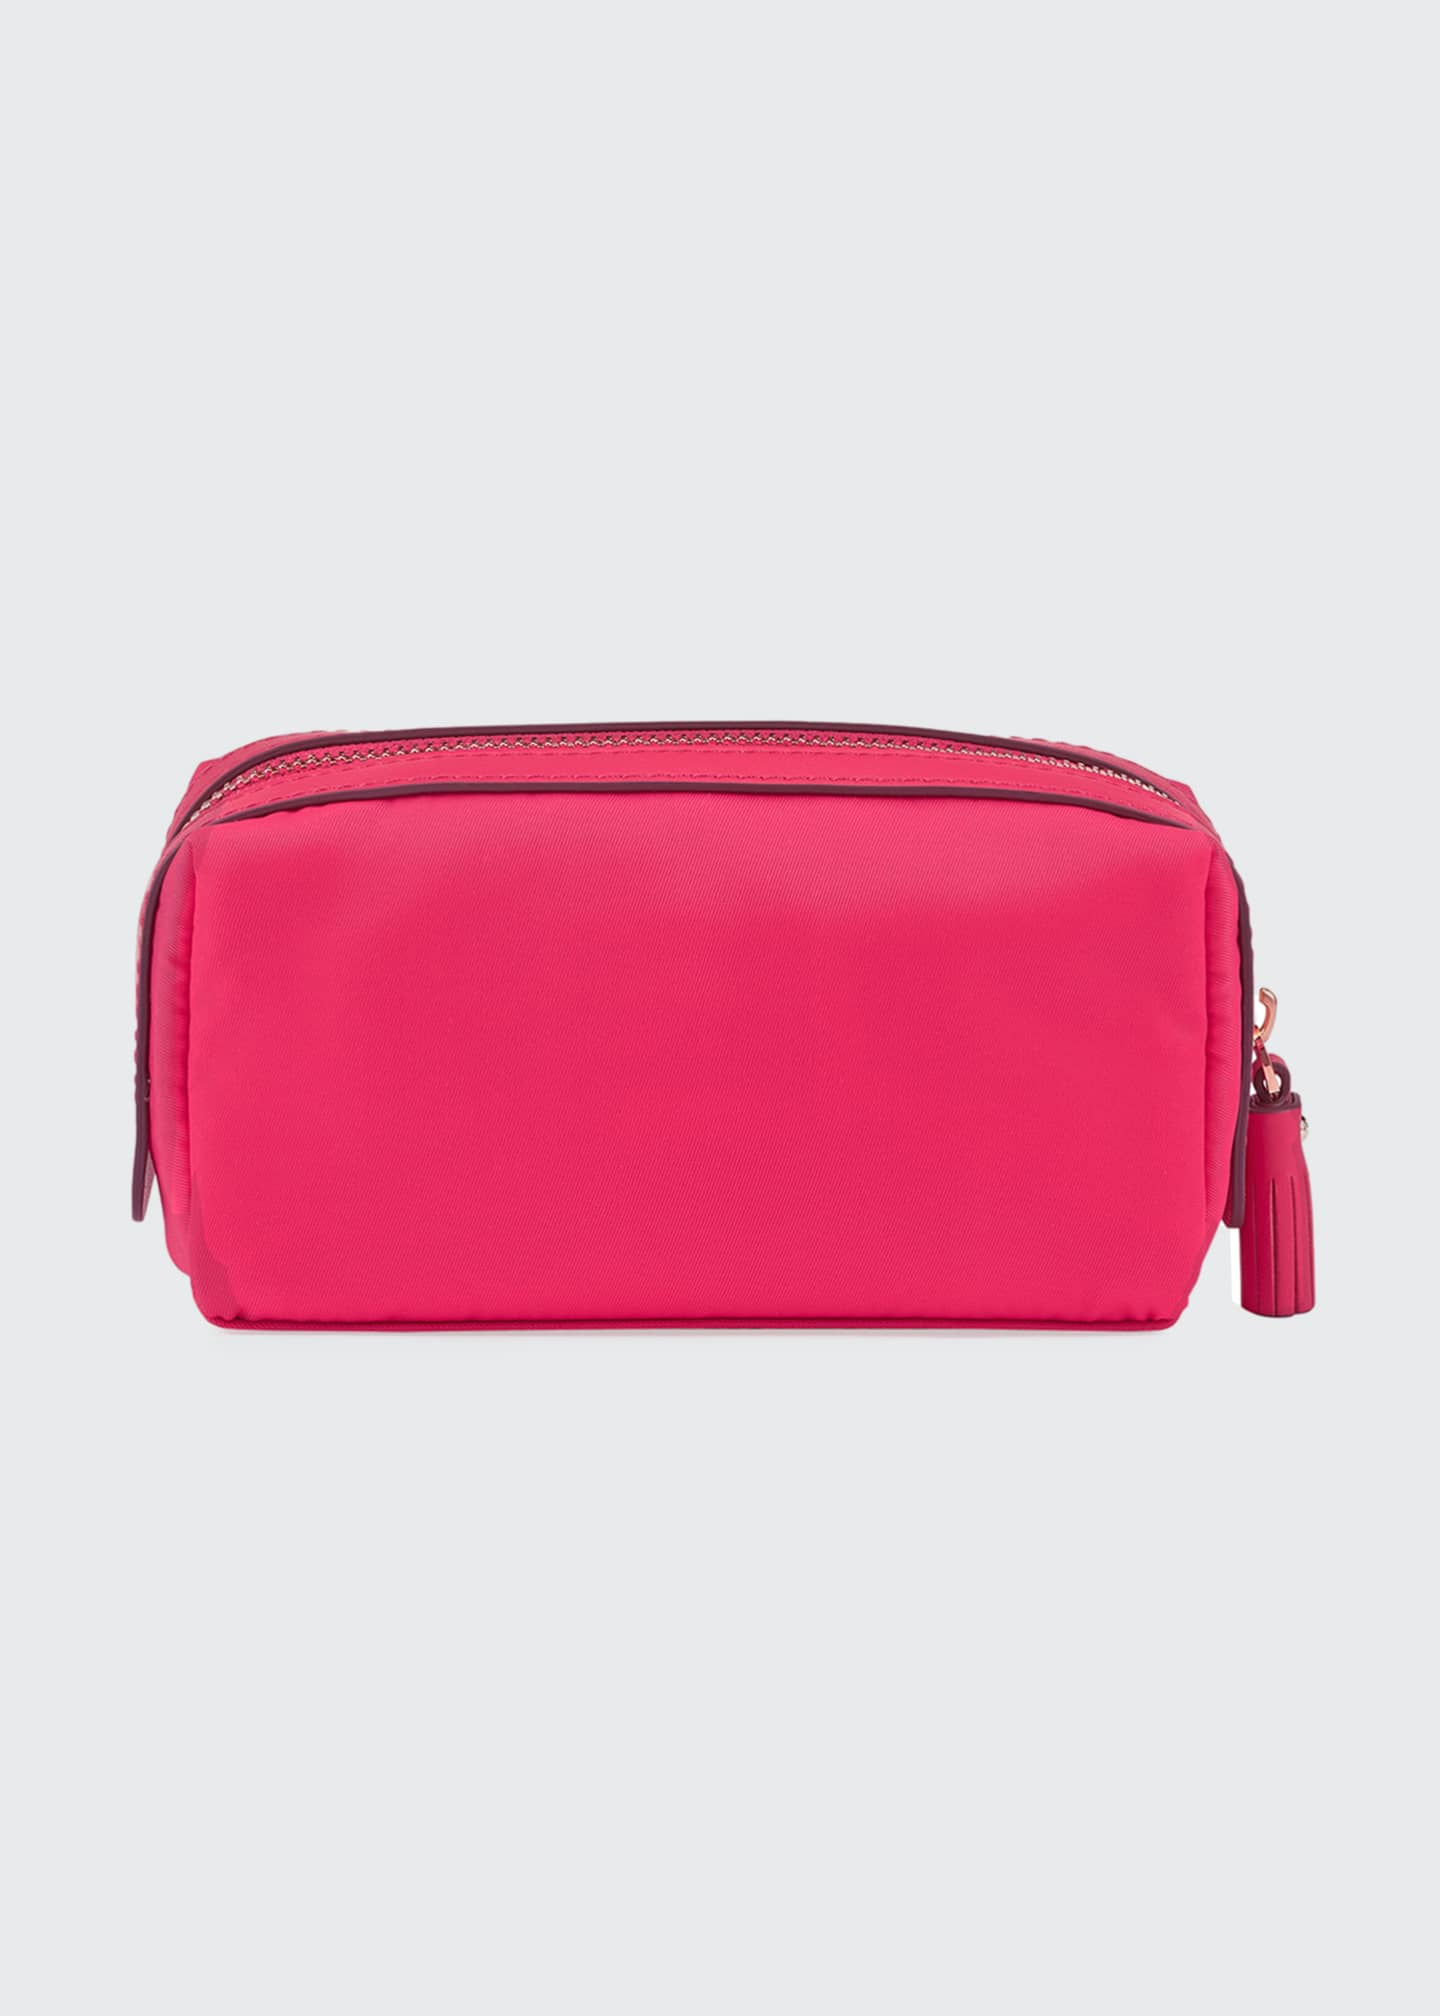 Anya Hindmarch Girlie Stuff Nylon Cosmetics Bag, Hot Pink - Bergdorf Goodman